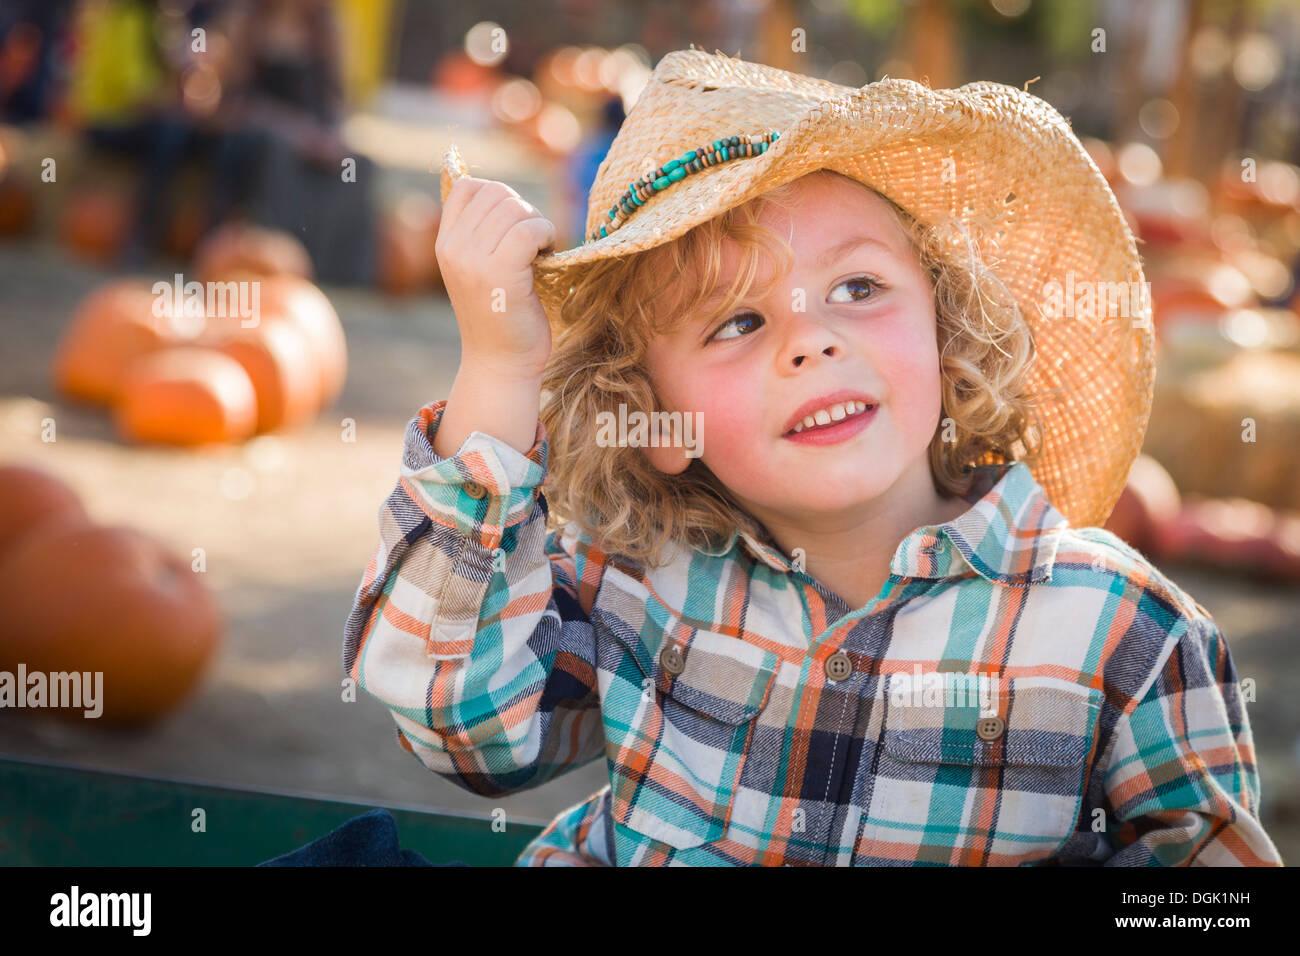 33f296066 Adorable pequeño niño usando sombrero de vaquero en Pumpkin Patch Farm.  Imagen De Stock